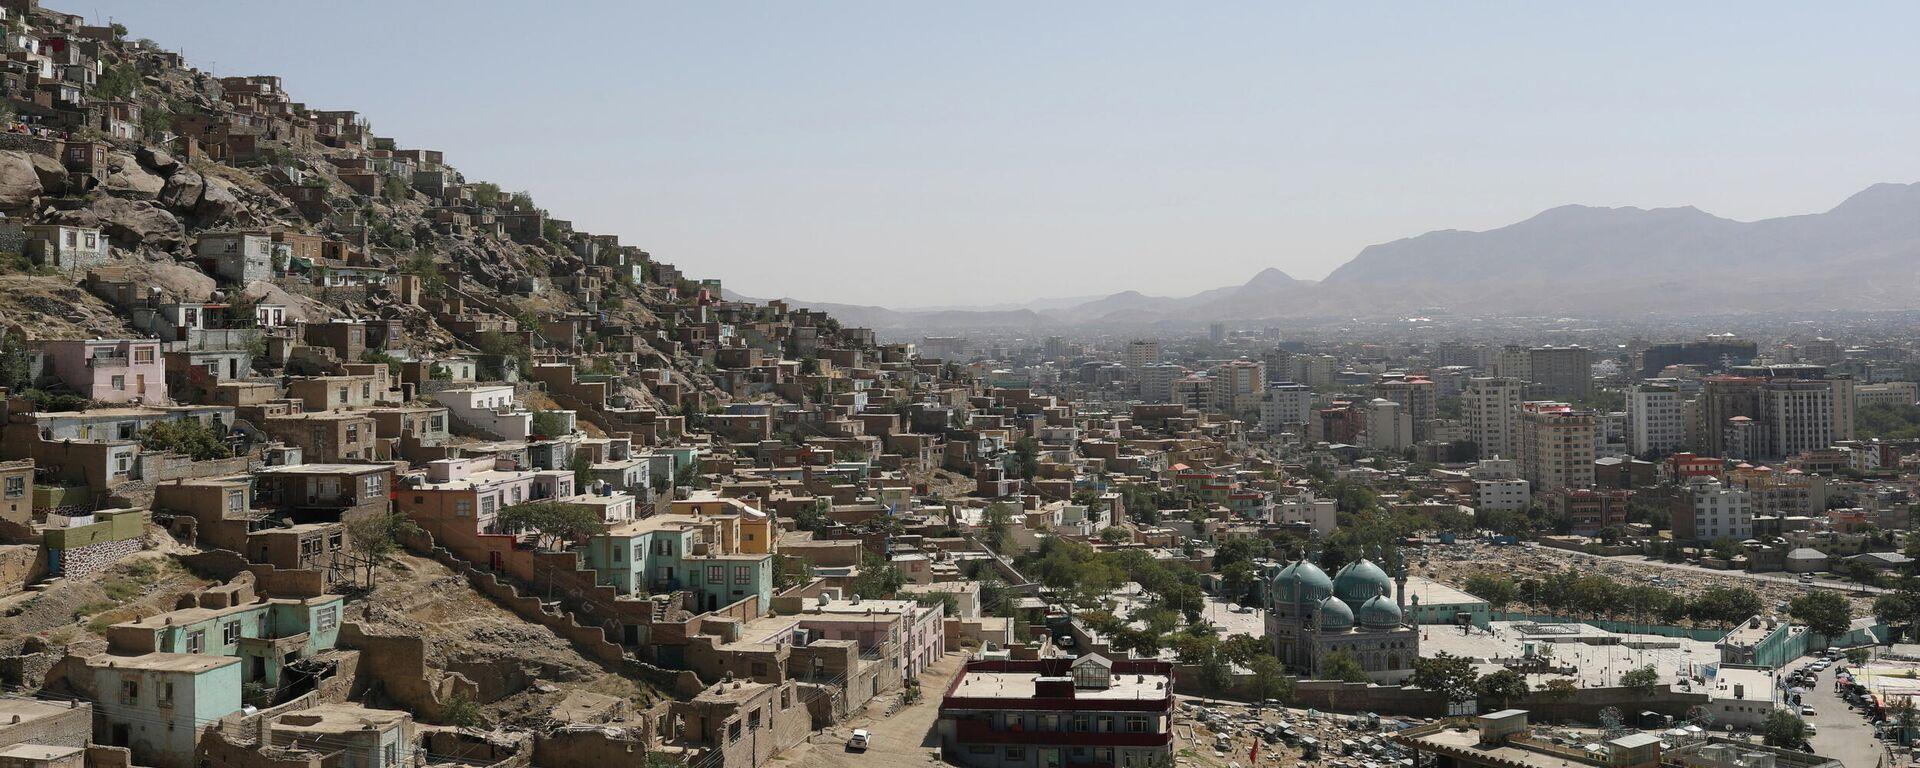 A general view of the city of Kabul - Sputnik International, 1920, 16.09.2021